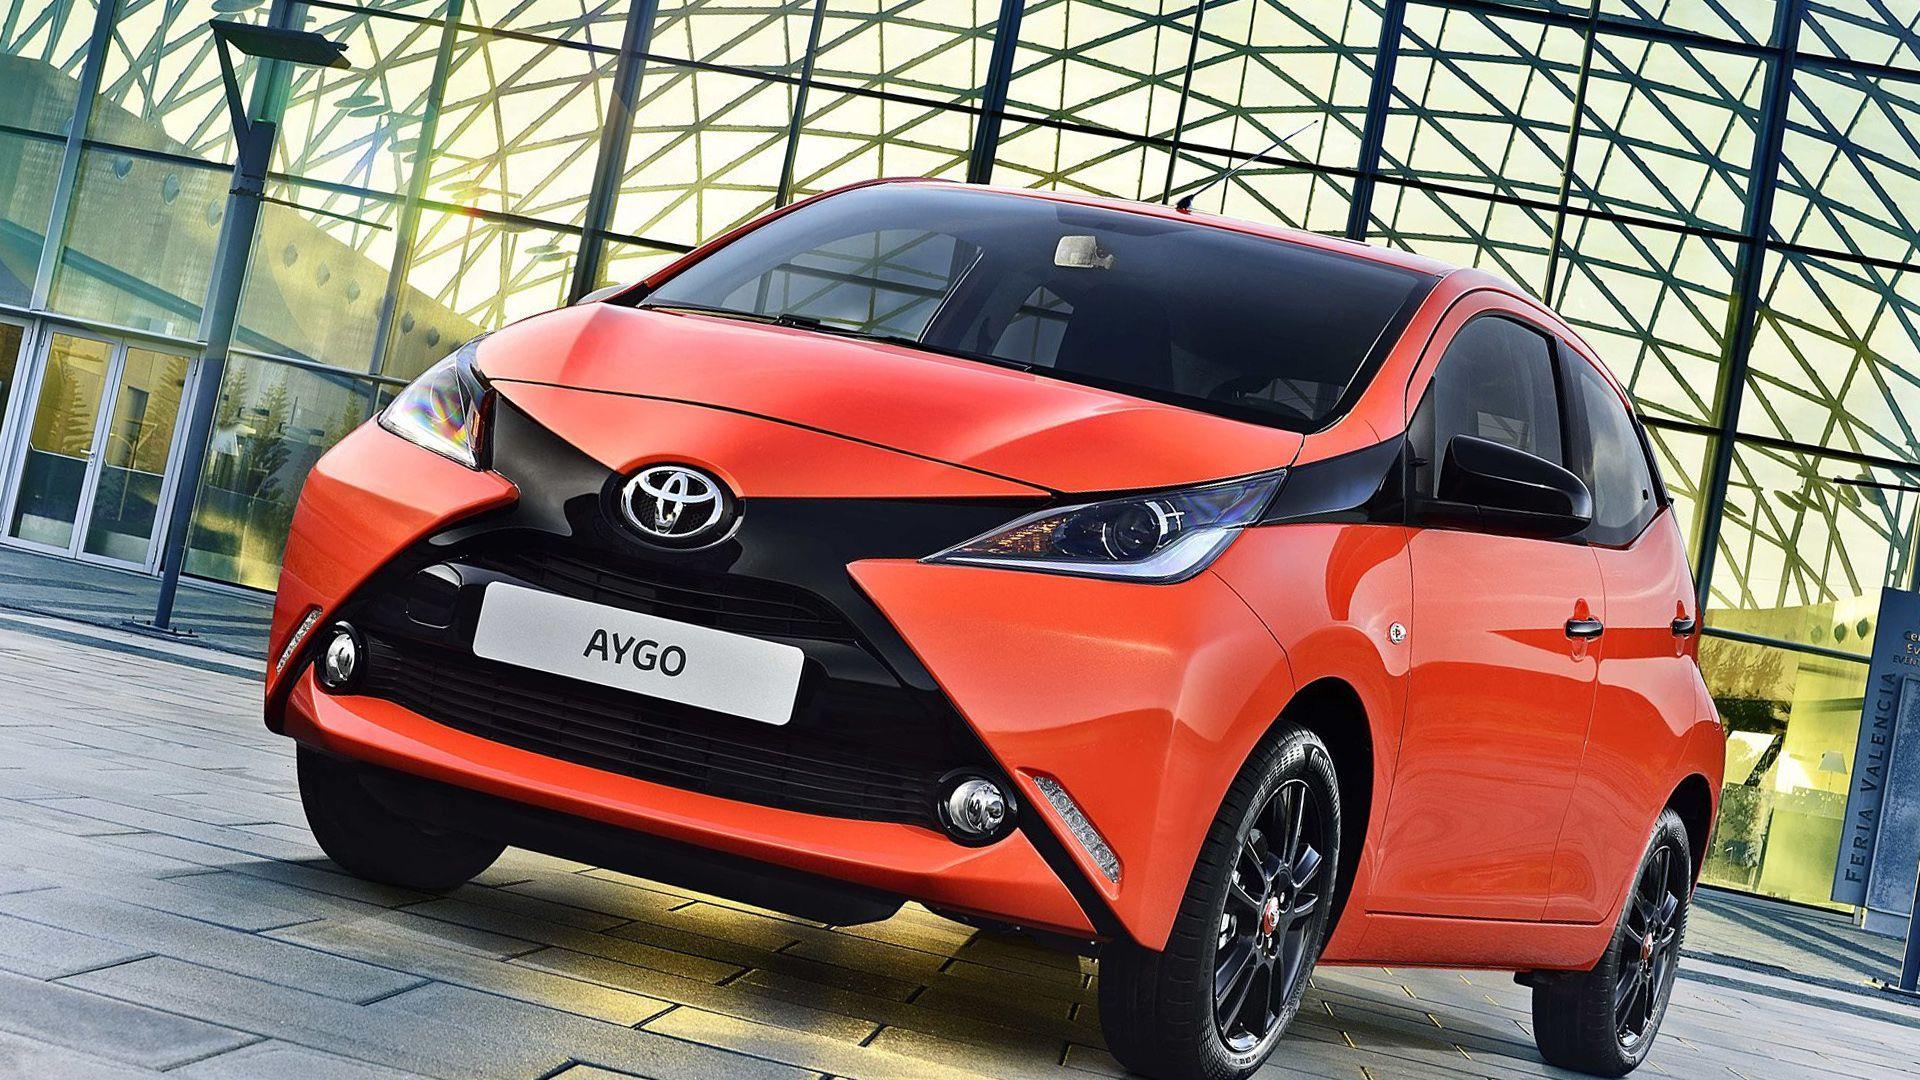 New 2019 Toyota Aygo Wallpaper HD Desktop Toyota car prices list 1920x1080